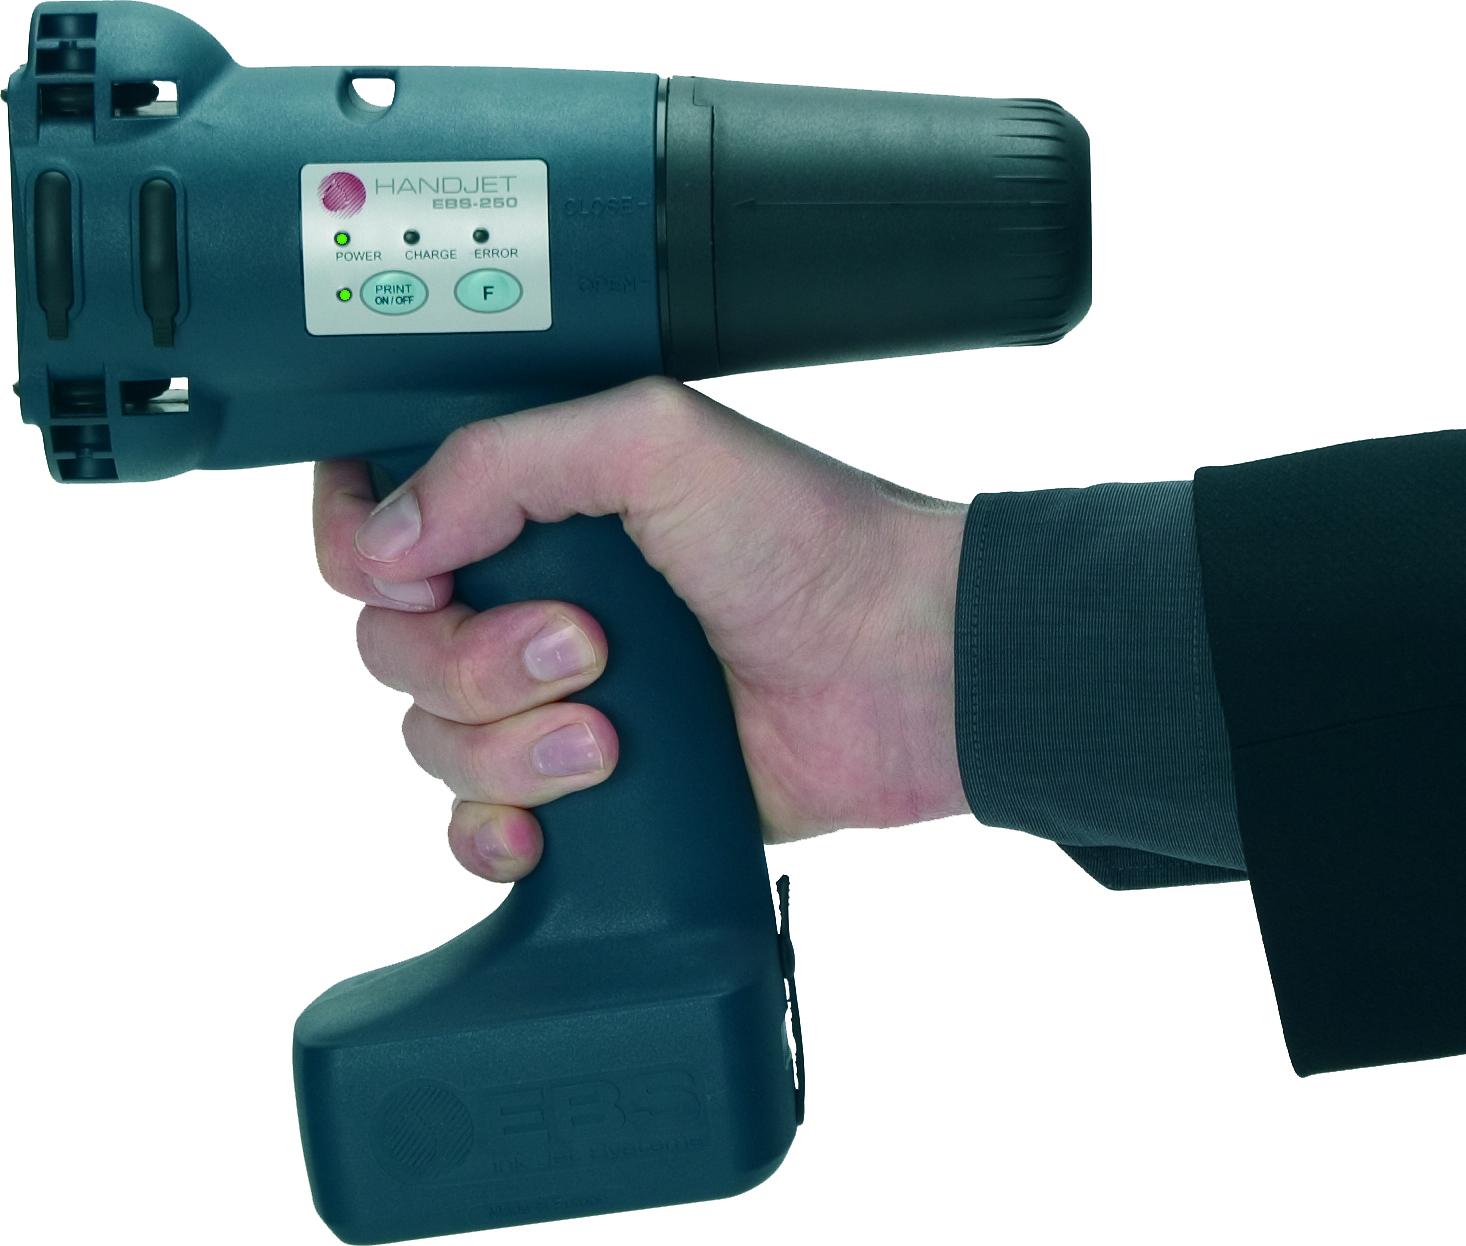 Cartridges Cleaning 4A004AR EBS Inkjet System marker Handjet EBS 250